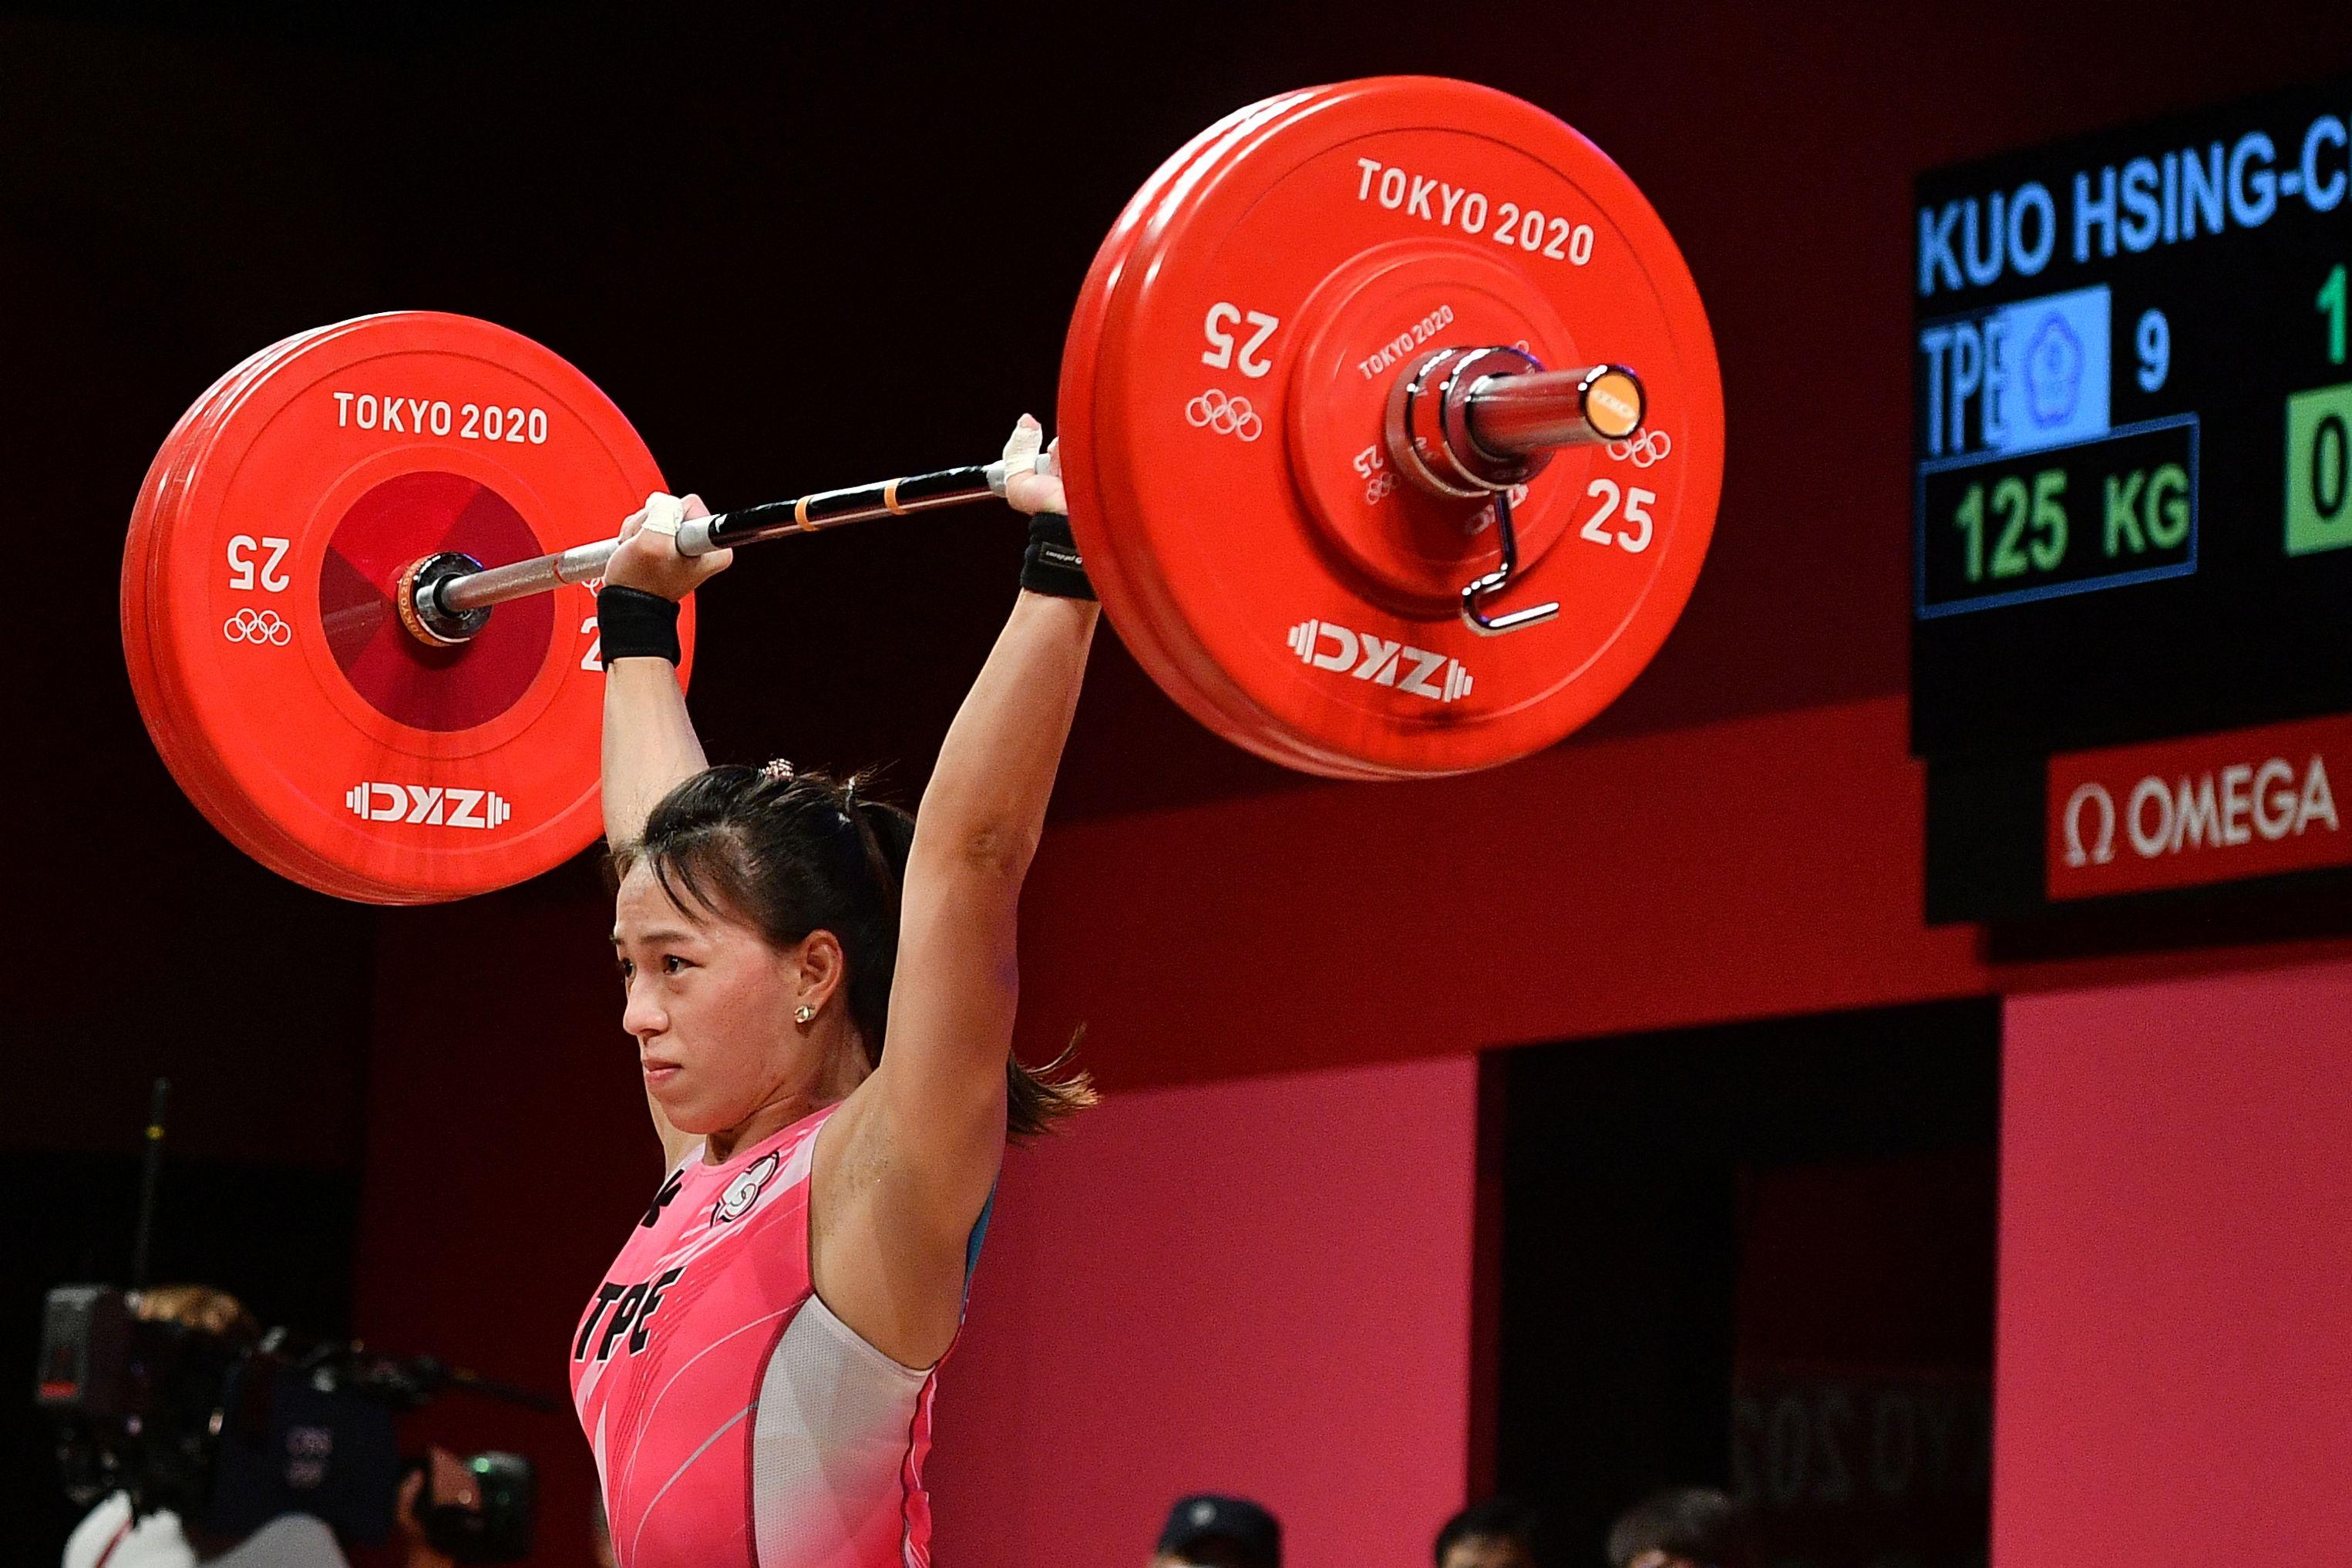 Kuo Hsing-chun Taiwan Olympics Gold Medal